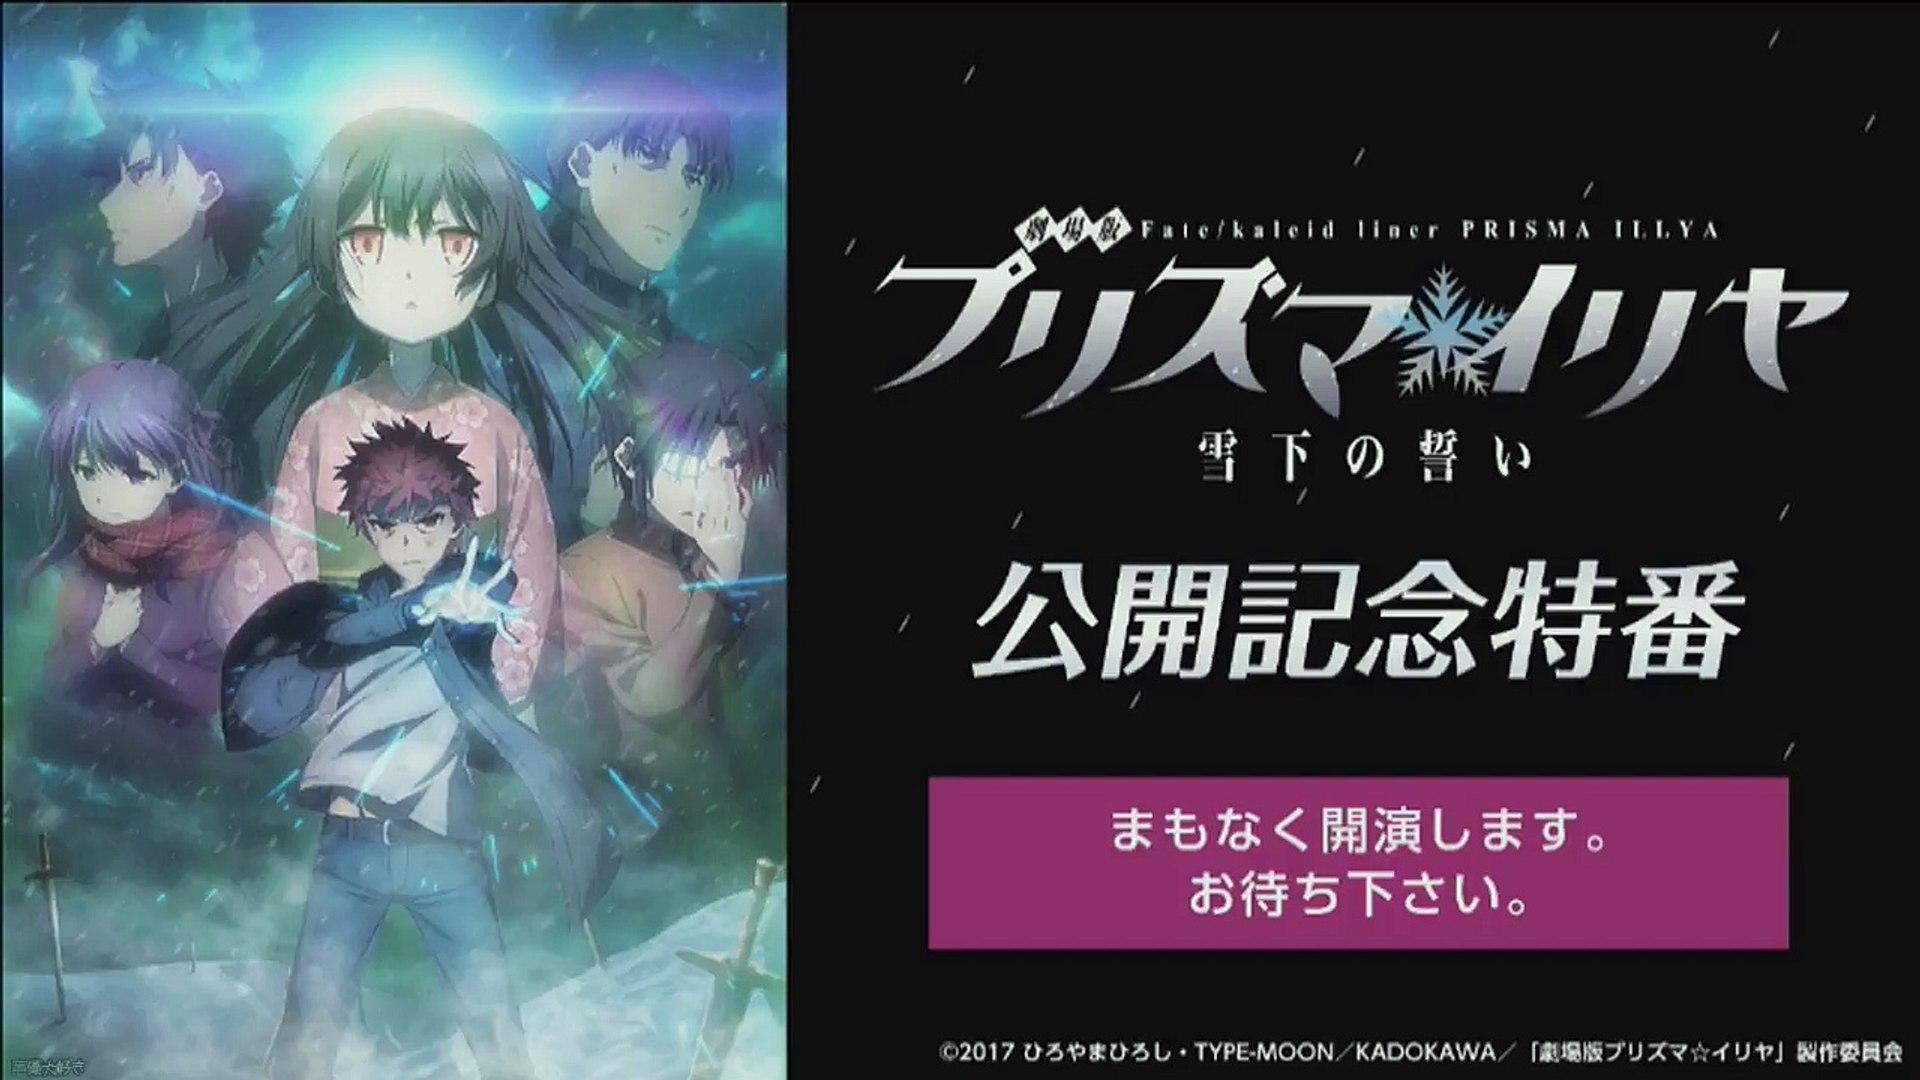 Fate Kaleid Liner 劇場版プリズマ イリヤ 雪下の誓い 公開記念